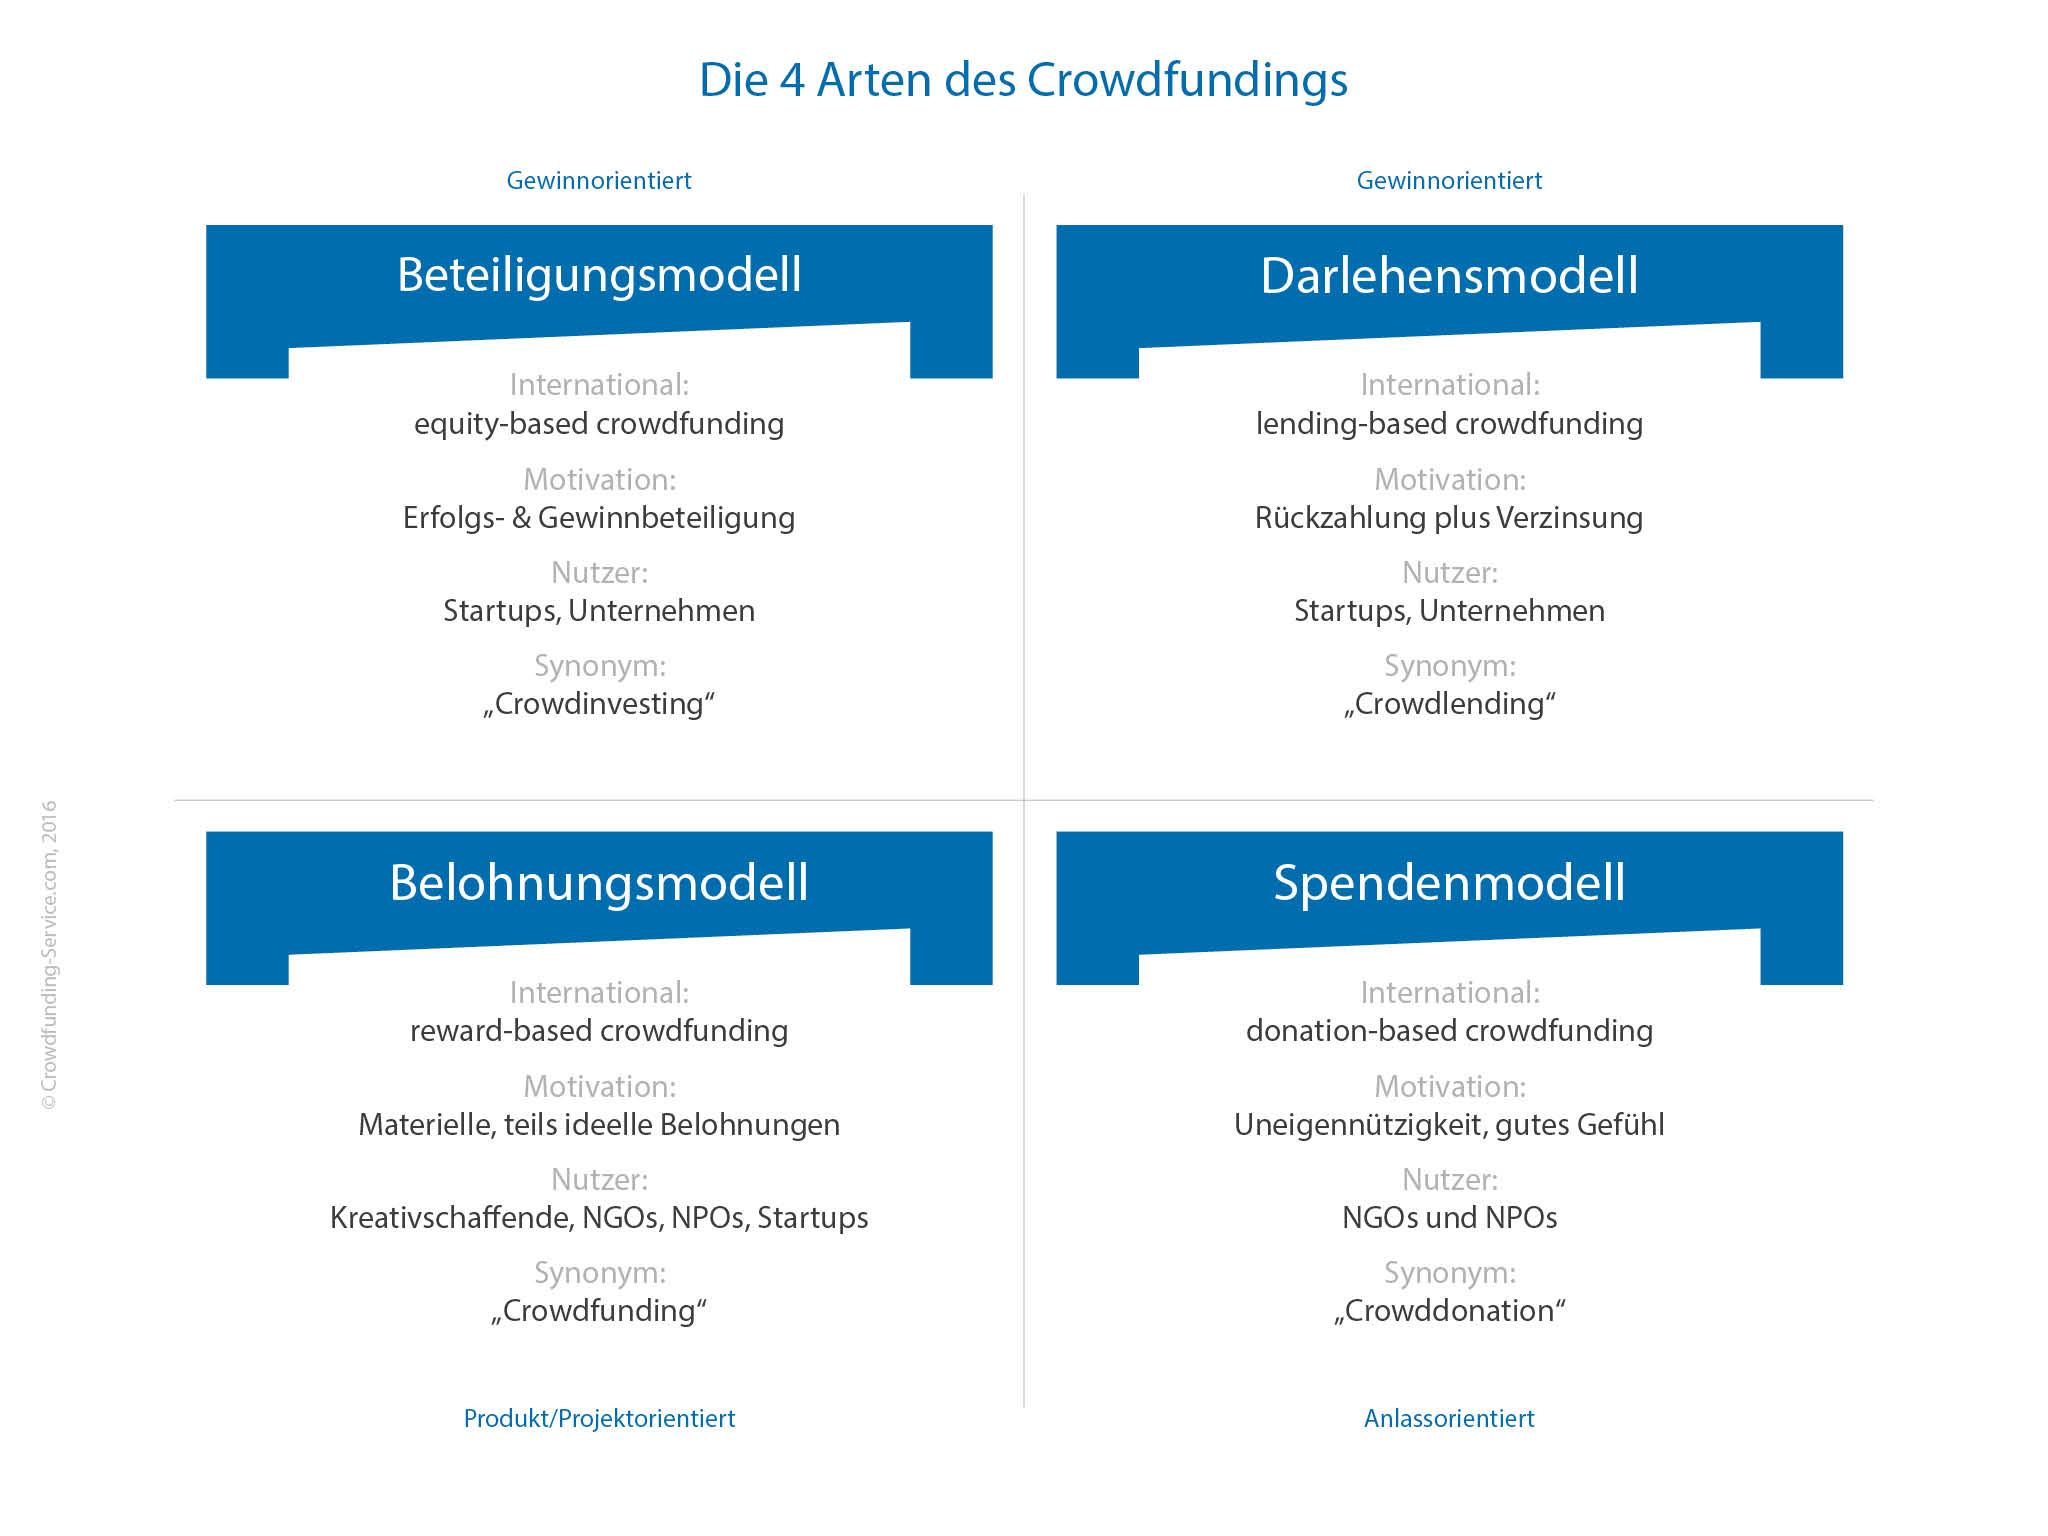 http://crowdfunding-service.com/wp-content/uploads/2016/01/Die-4-Arten-des-Crowdfundings.jpg